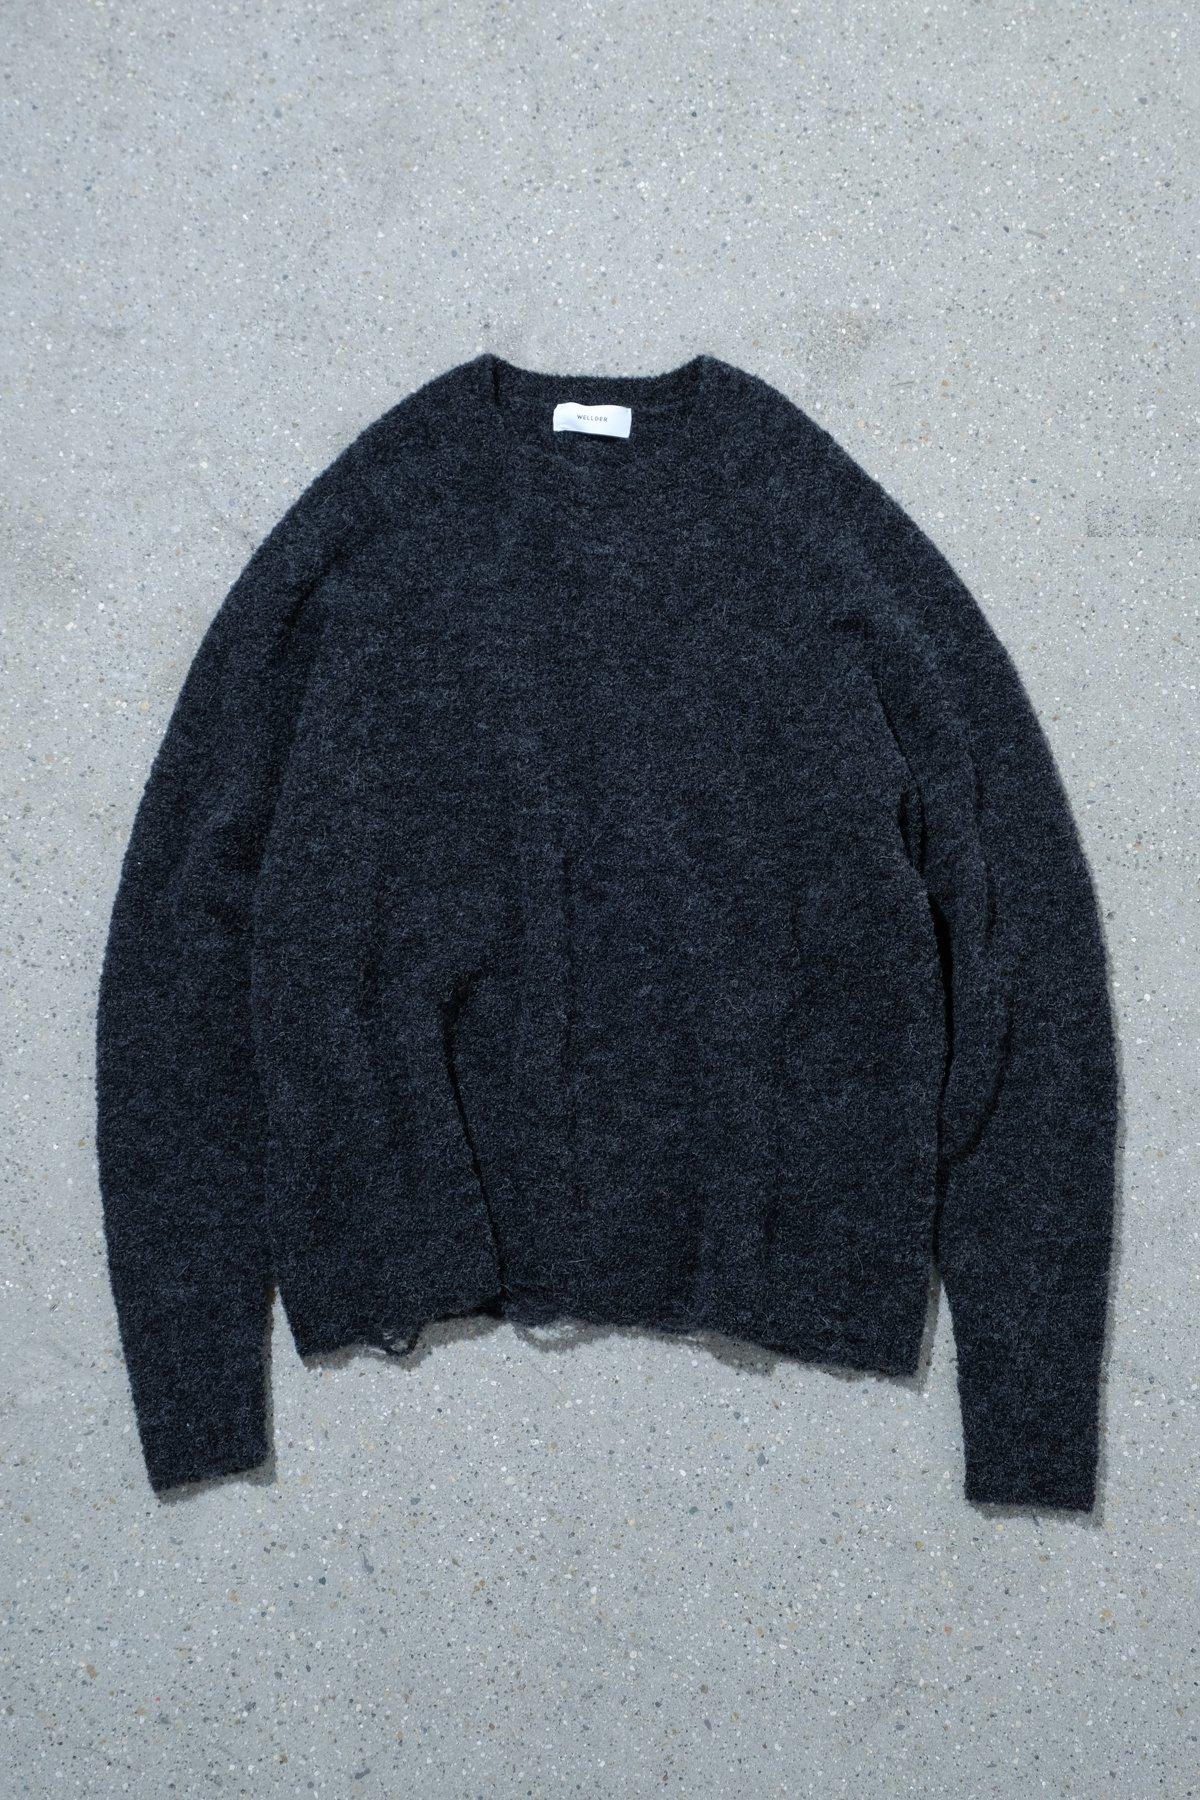 WELLDER / Damage Design Pull Over Knit